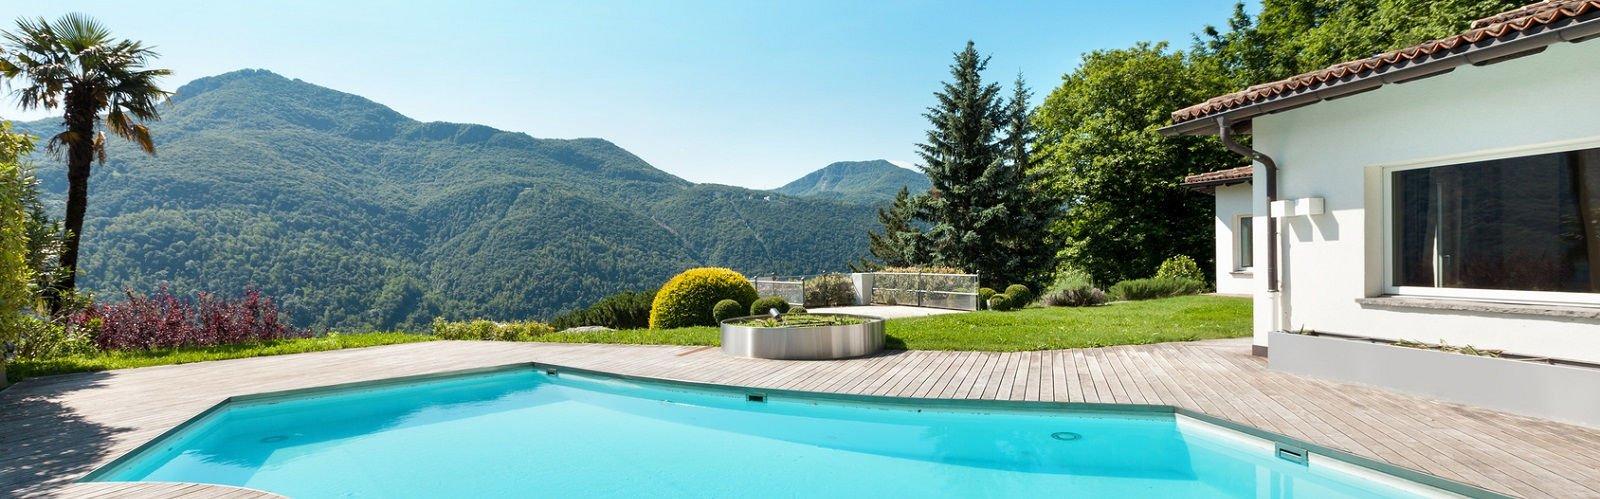 Location maison avec piscine villa avec piscine for Villa vacances piscine